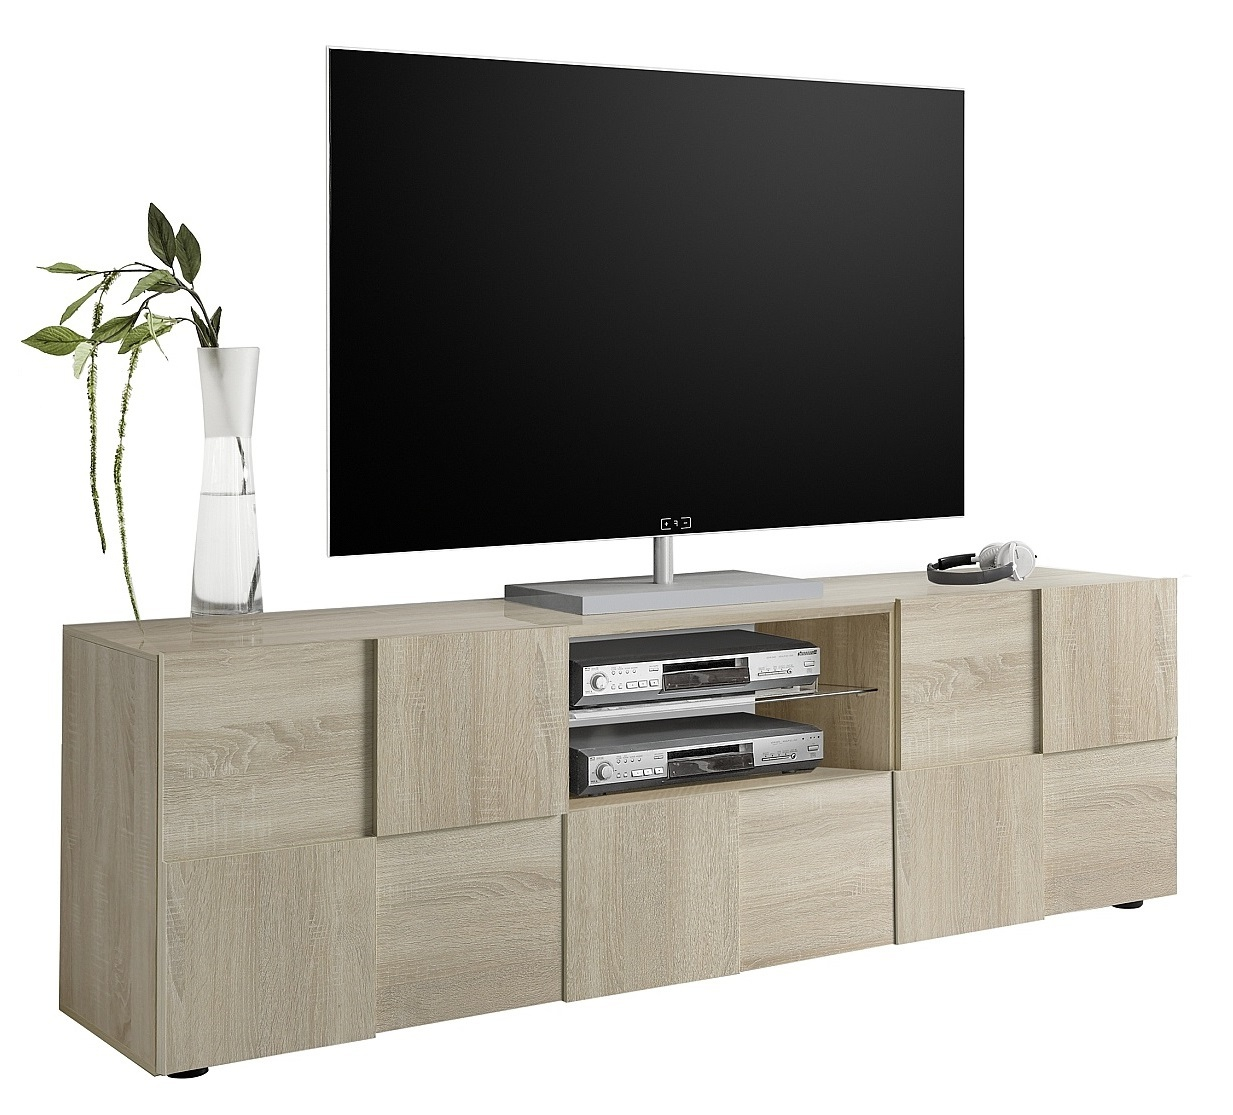 Tv-meubel Dama 181 cm breed in sonoma eiken   Pesaro Mobilia